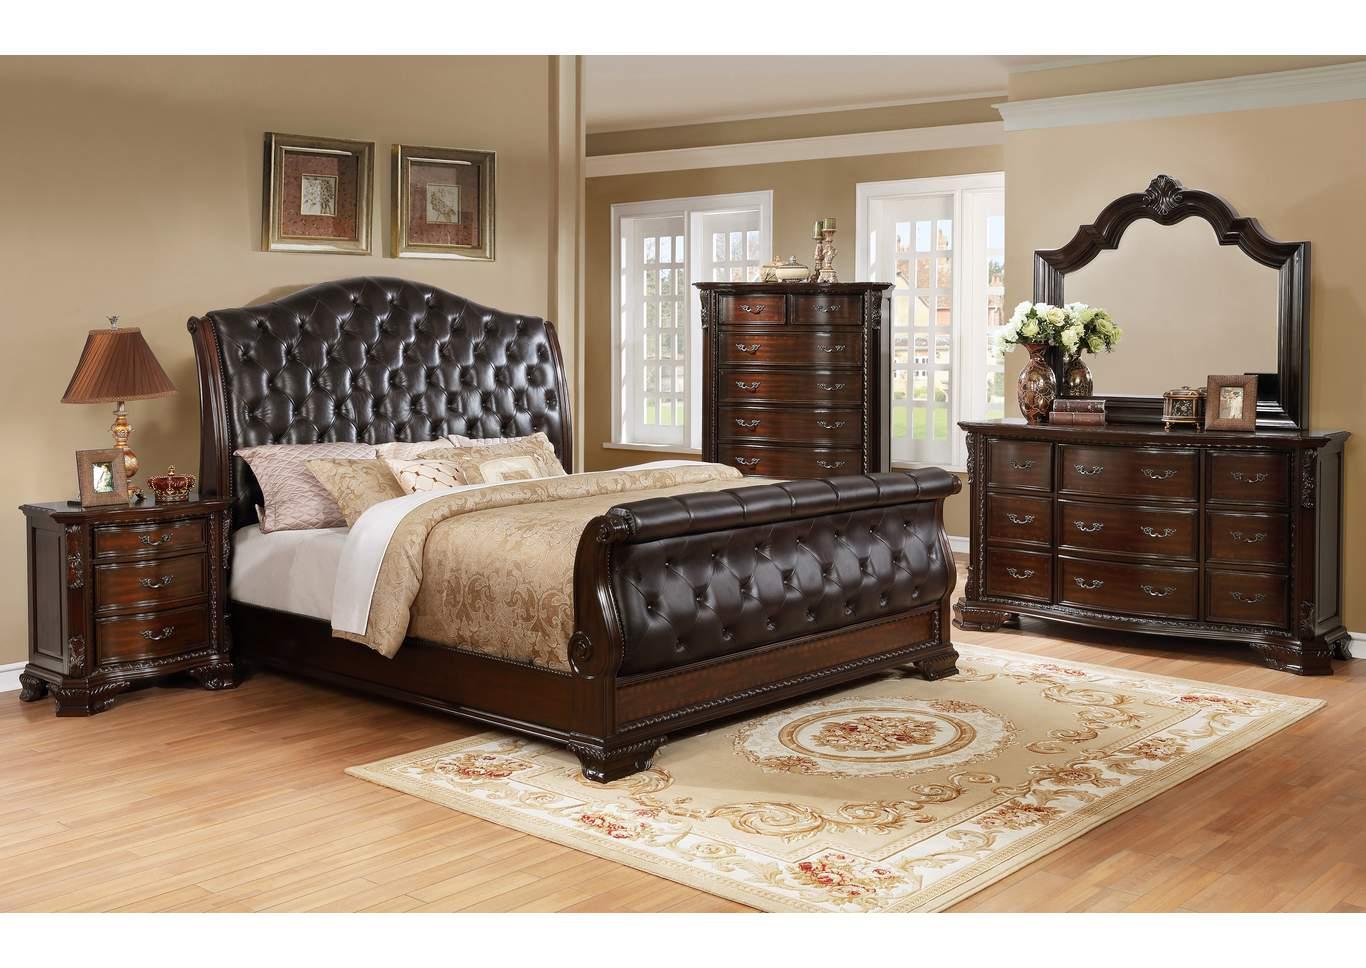 Fowler Furniture Mullins SC Sheffield Upholstered King Sleigh Bed - Bedroom furniture shops in sheffield